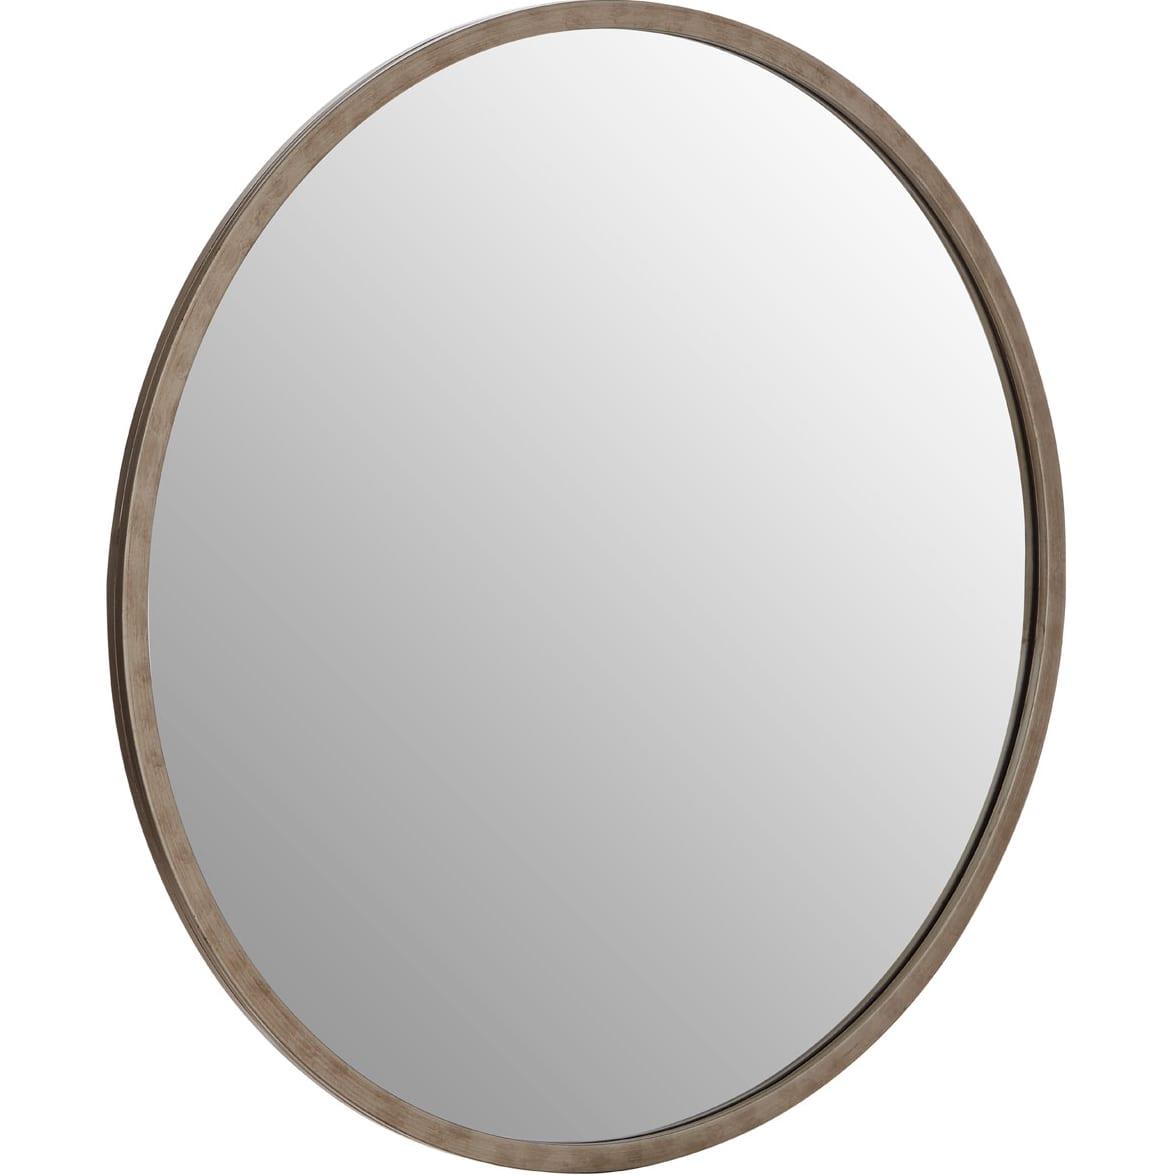 Saskina Wall Mirror With Antique Silver Frame